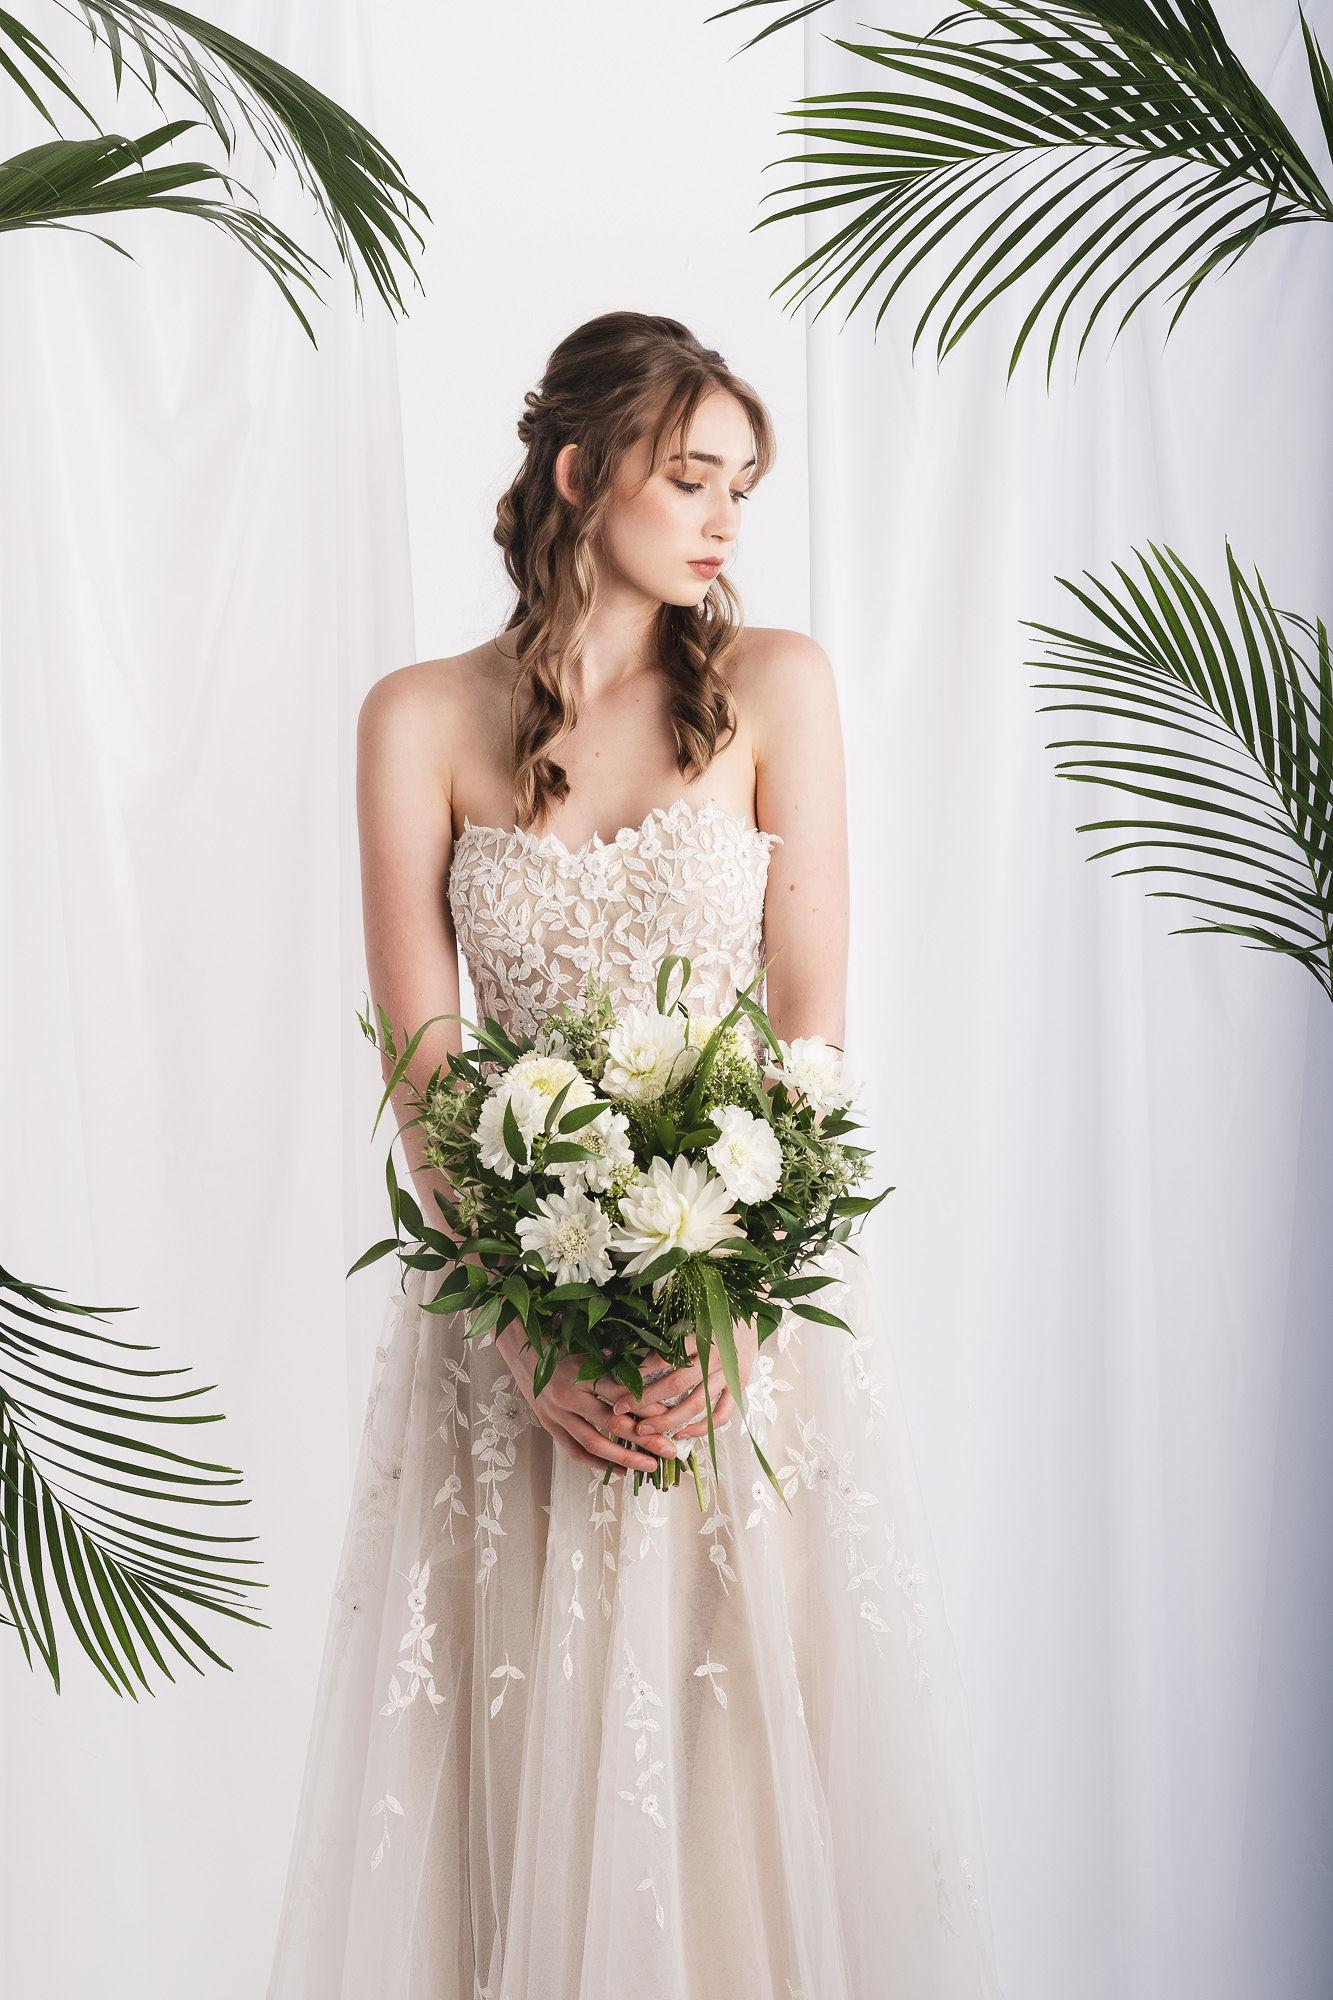 360_Wedding_Portfolio_20190721-Modifier.jpg